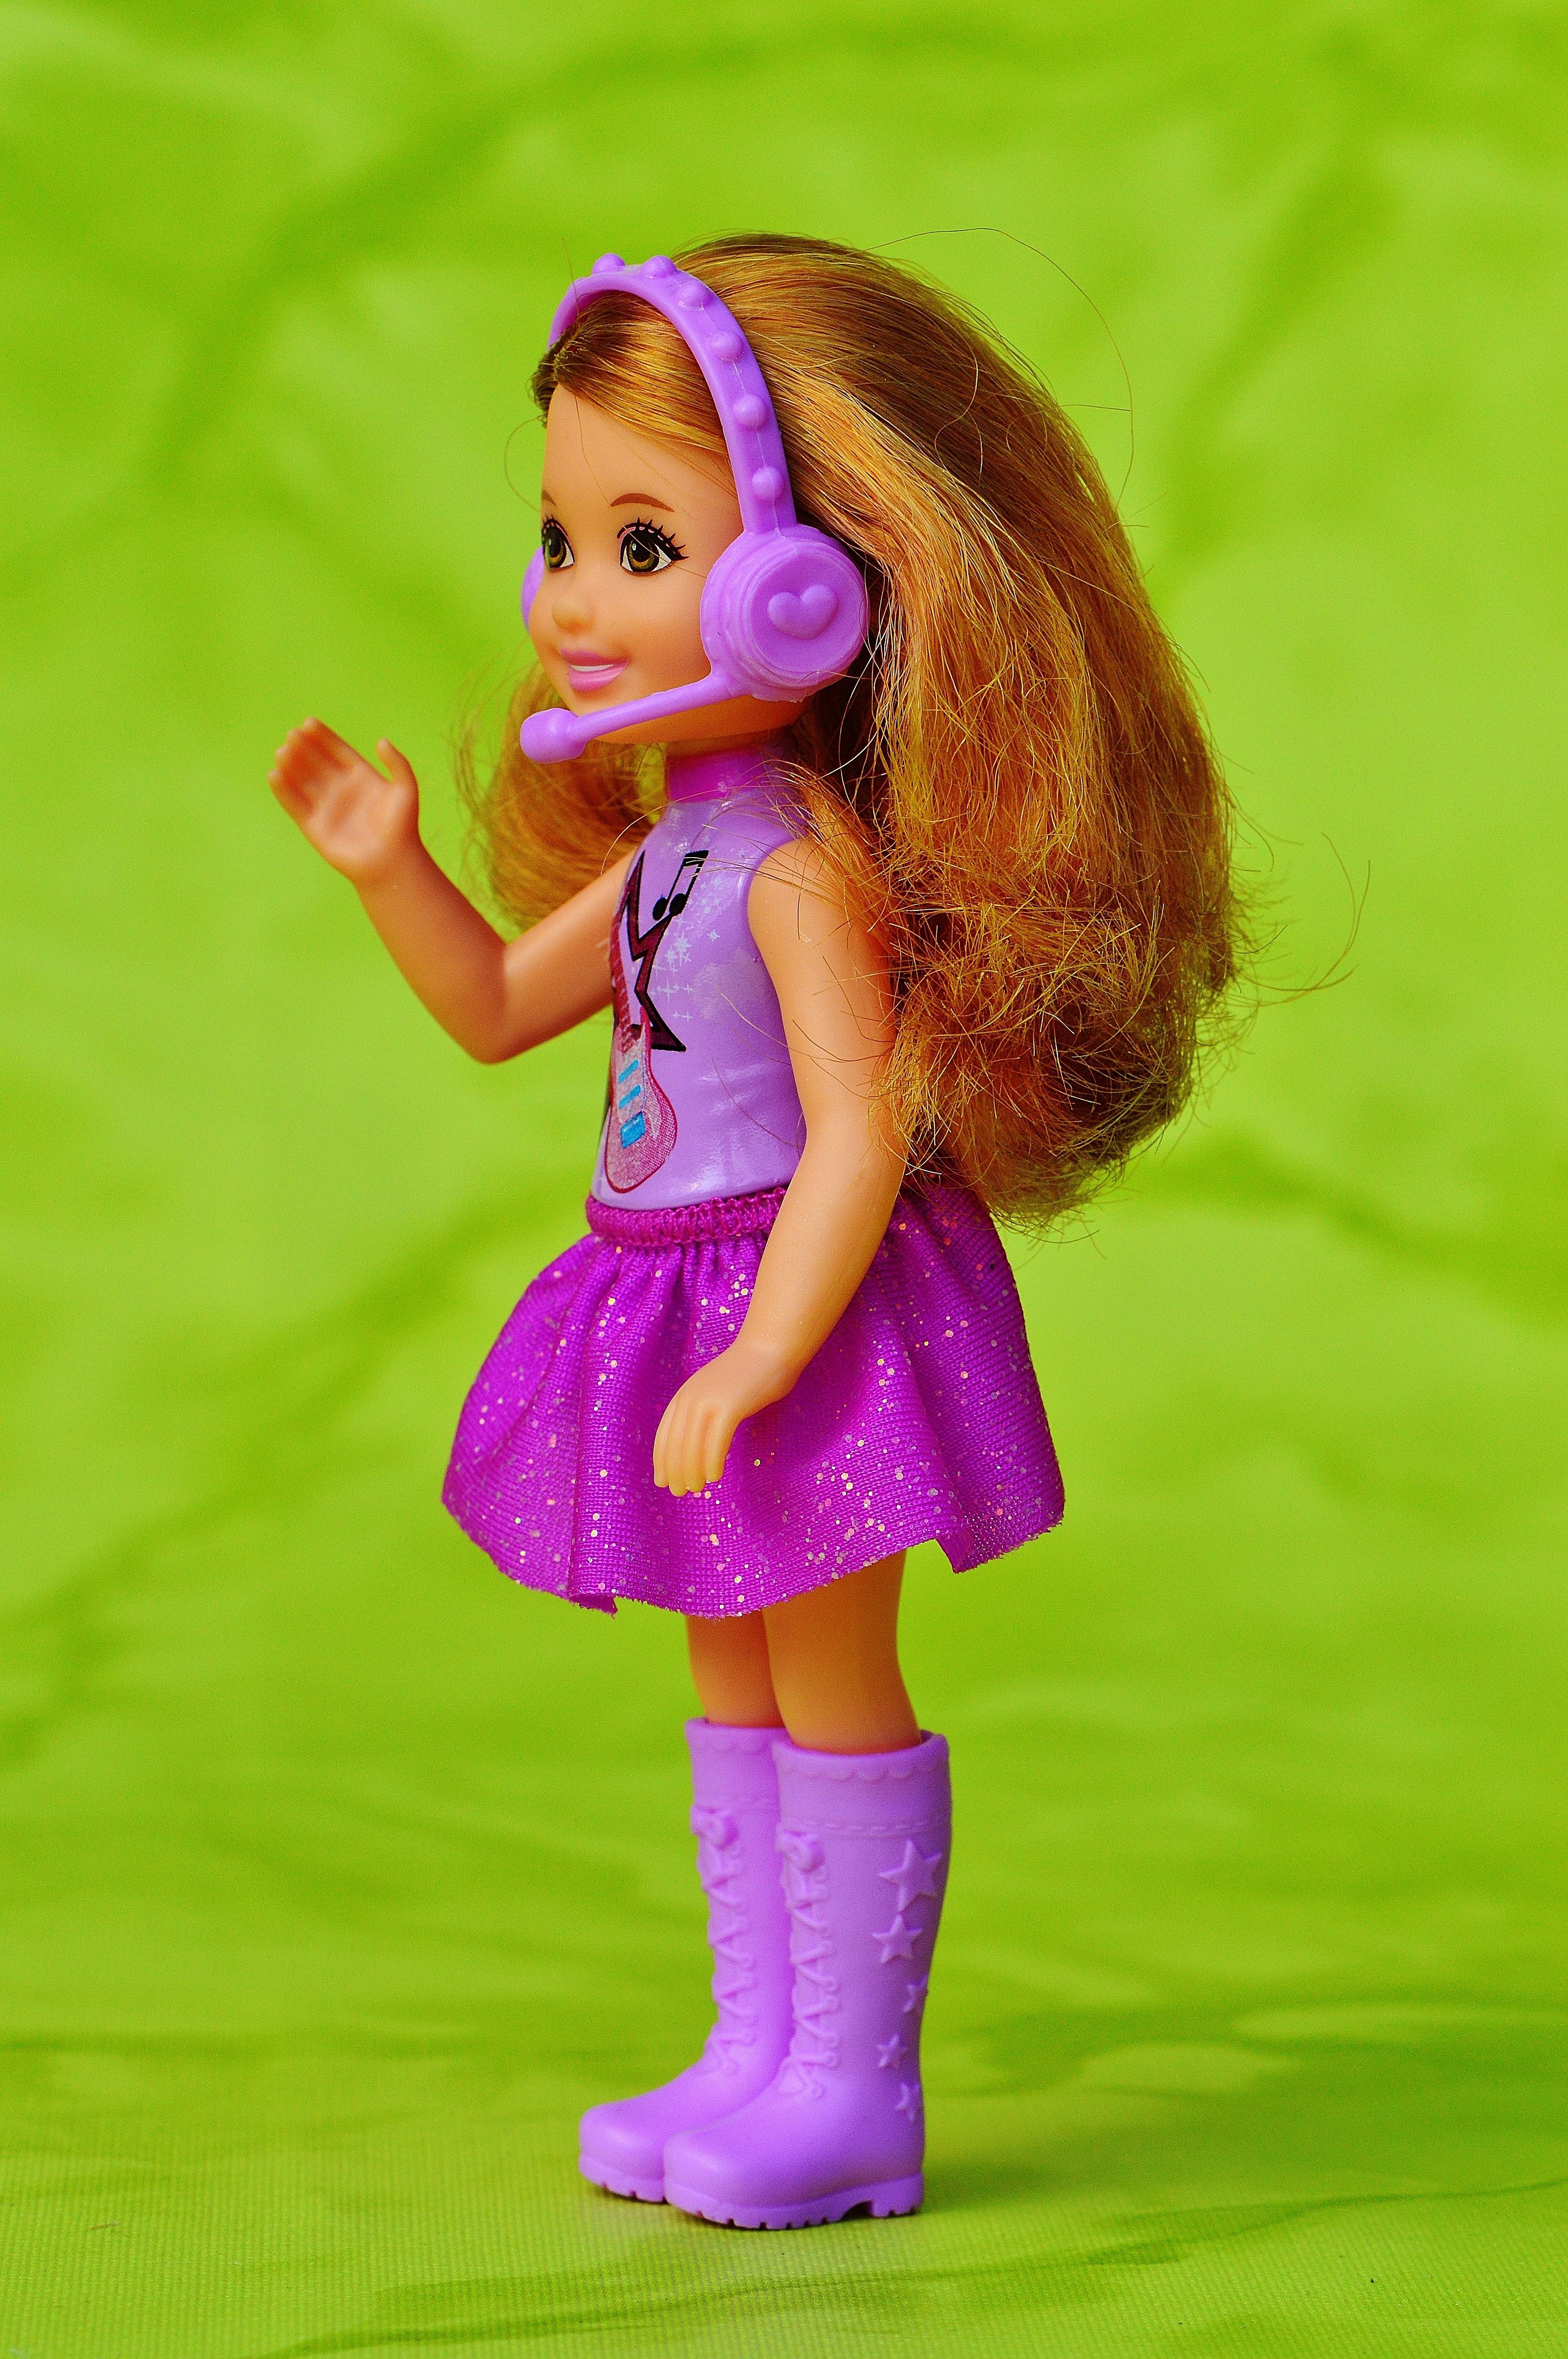 Smile Toys And Joys : Fotoğraf müzik kız saç oyun sevimli mikrofon çocuk